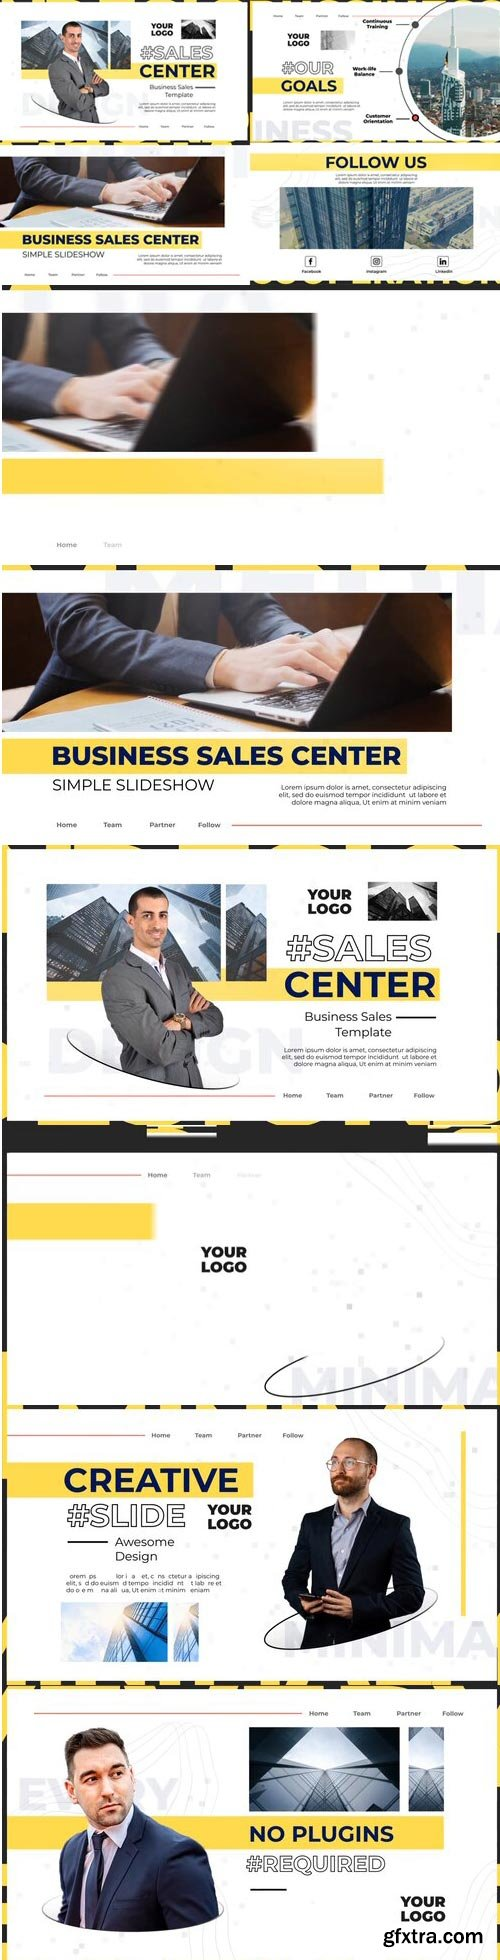 Videohive - Creative Business Corporate Slideshow - 33871429